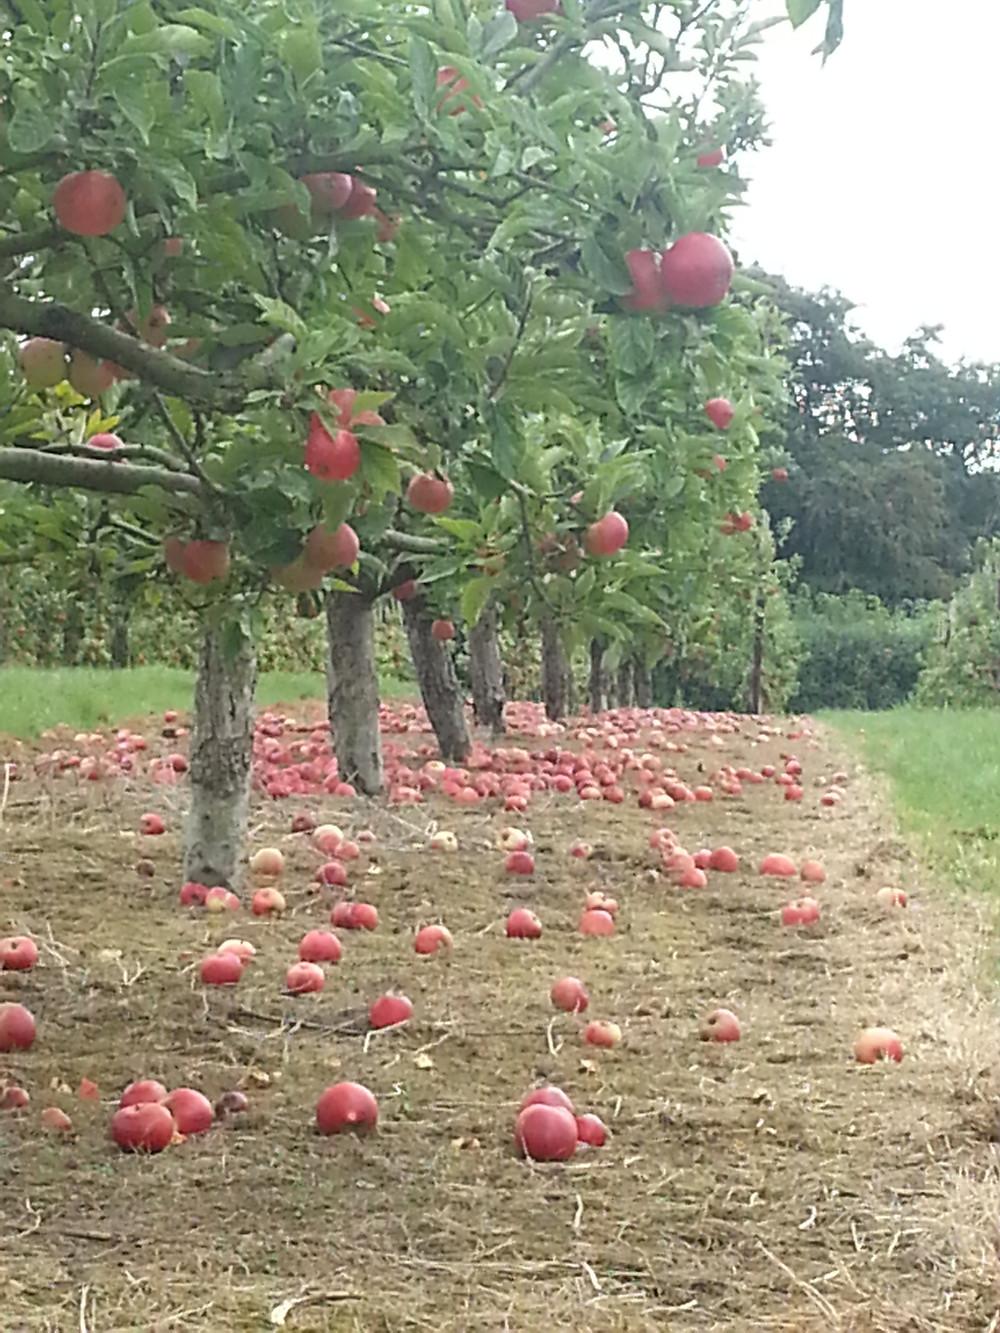 an abundance of apples in Avalon